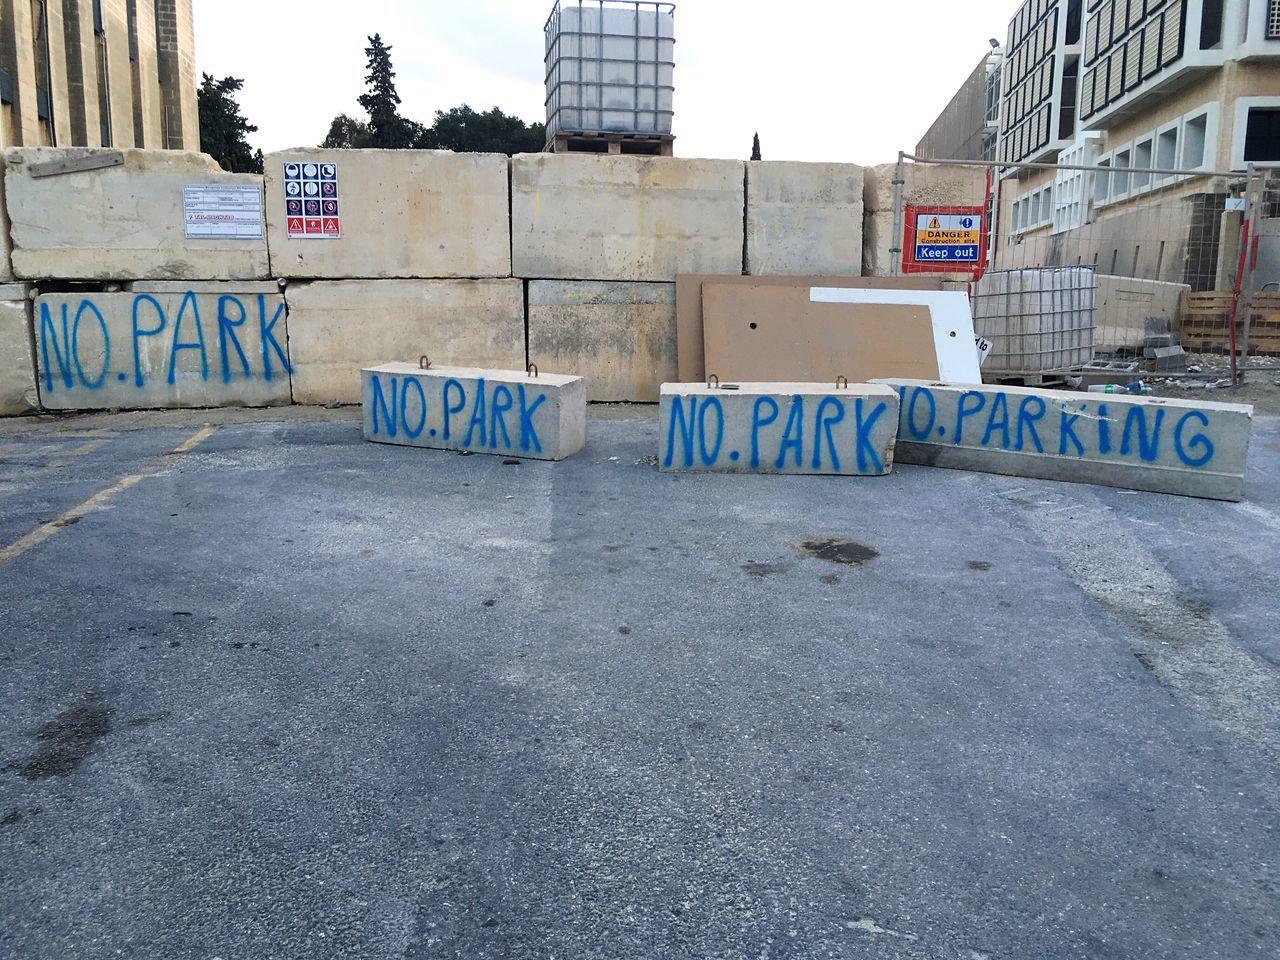 No Parking University Of Malta Campus Of Malta Forbidden Parking Maltagraphy